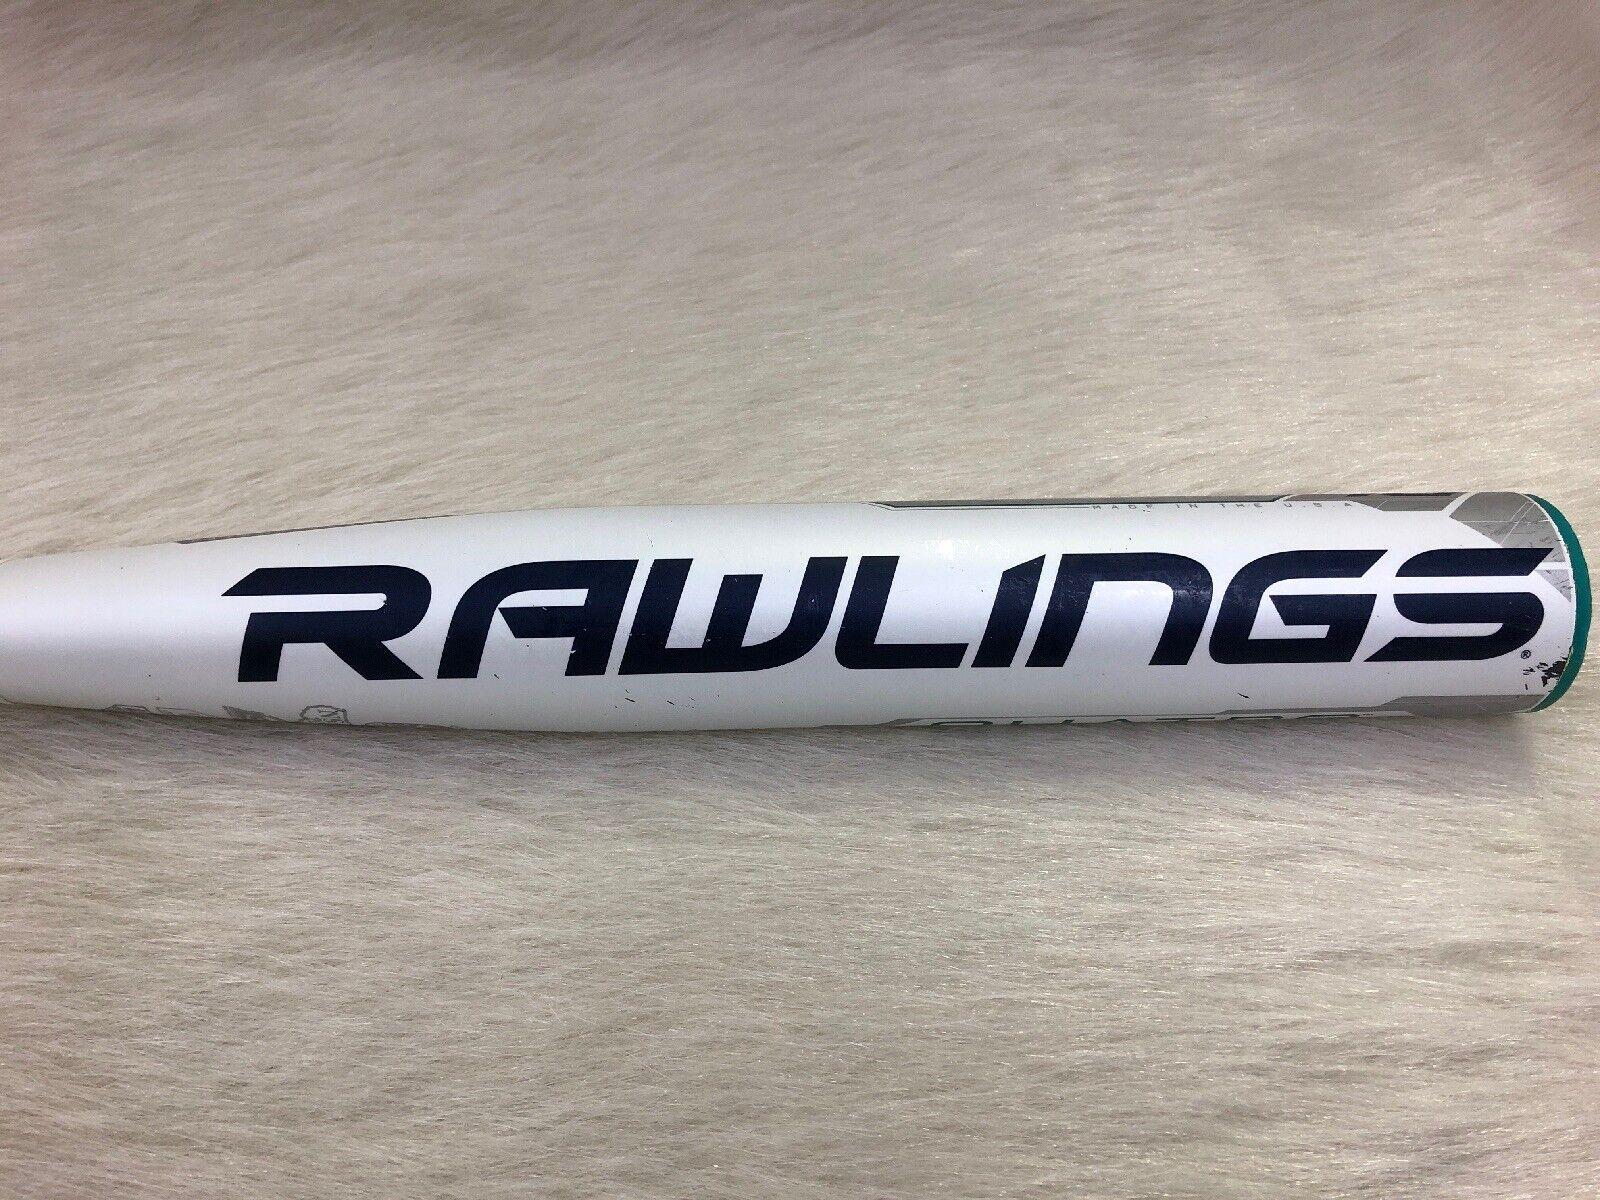 2017 Rawlings Quatro 31 21 FP7Q10 (-10) Fastpitch Softball Bat